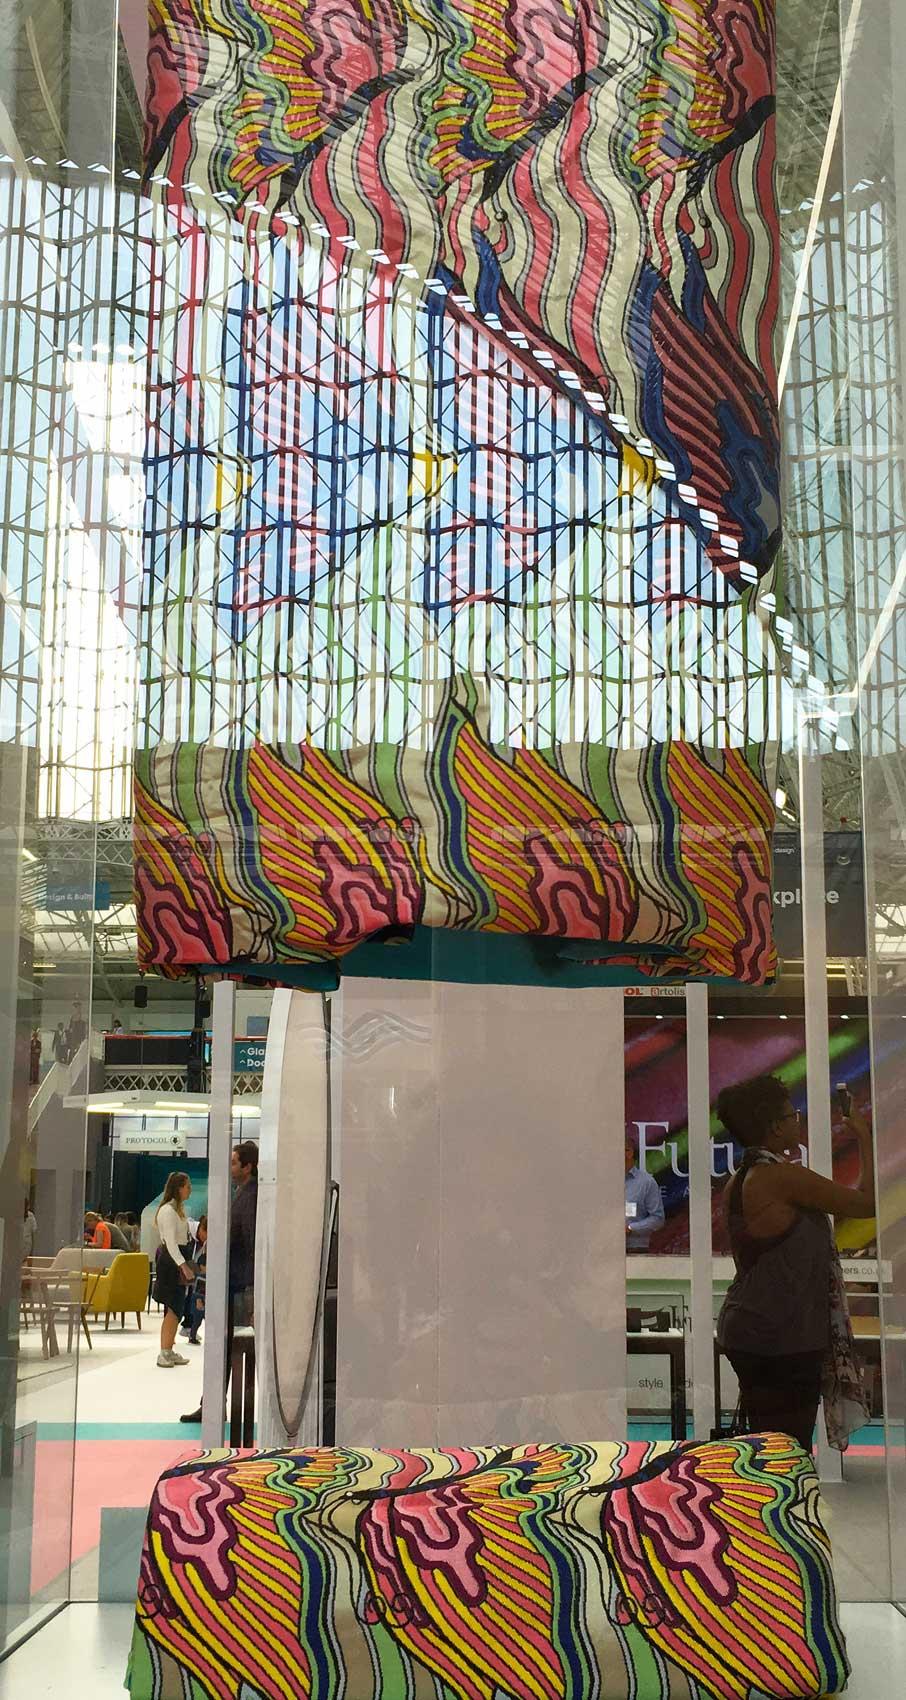 London-Design-Festival-multi-tier-display-of-colourful-textile